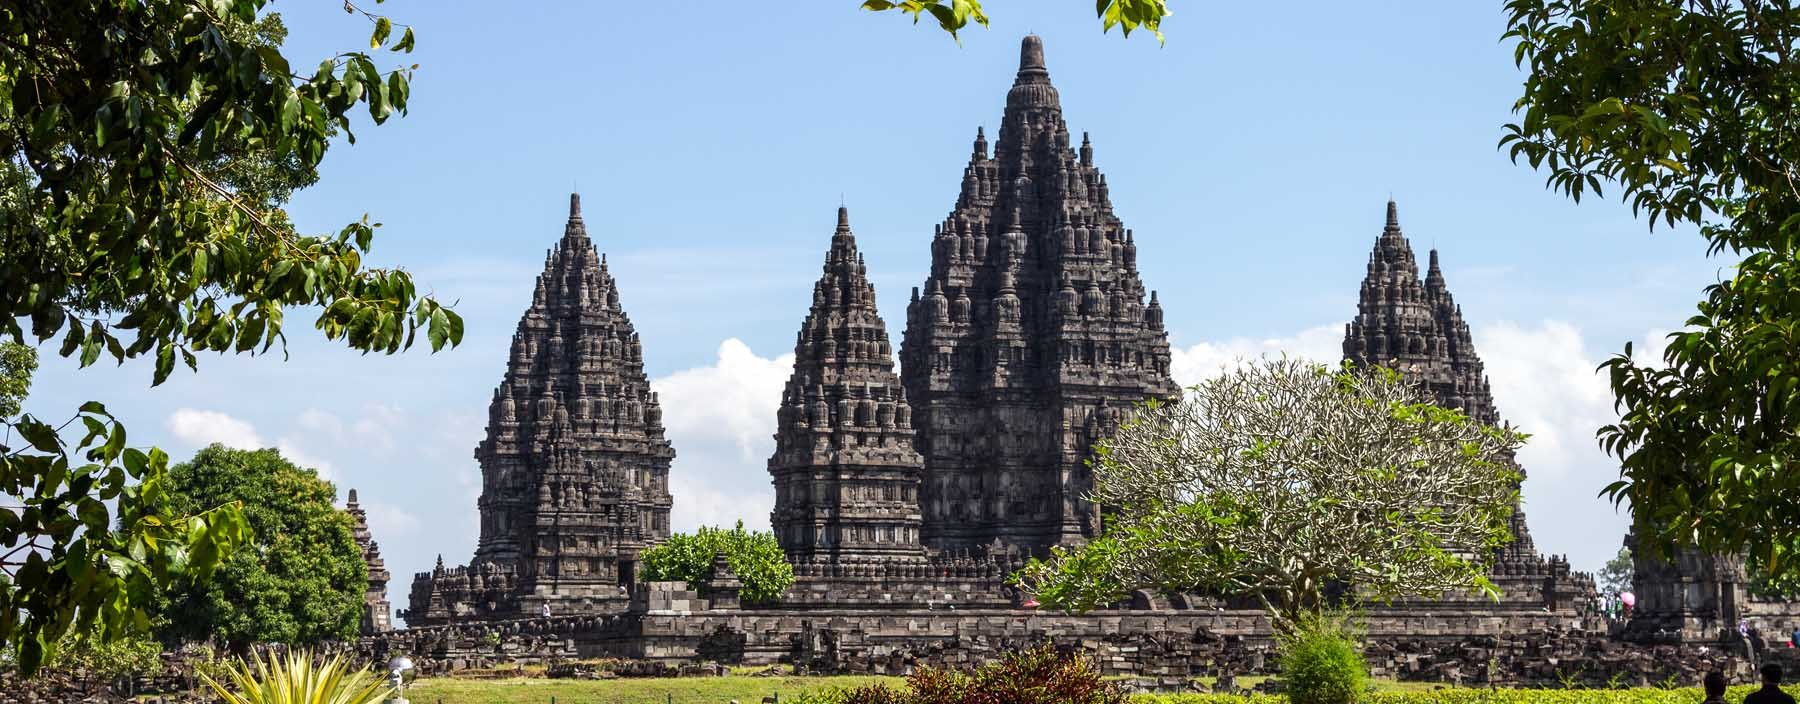 id, java, jogjakarta, prambanan temple (2).jpg